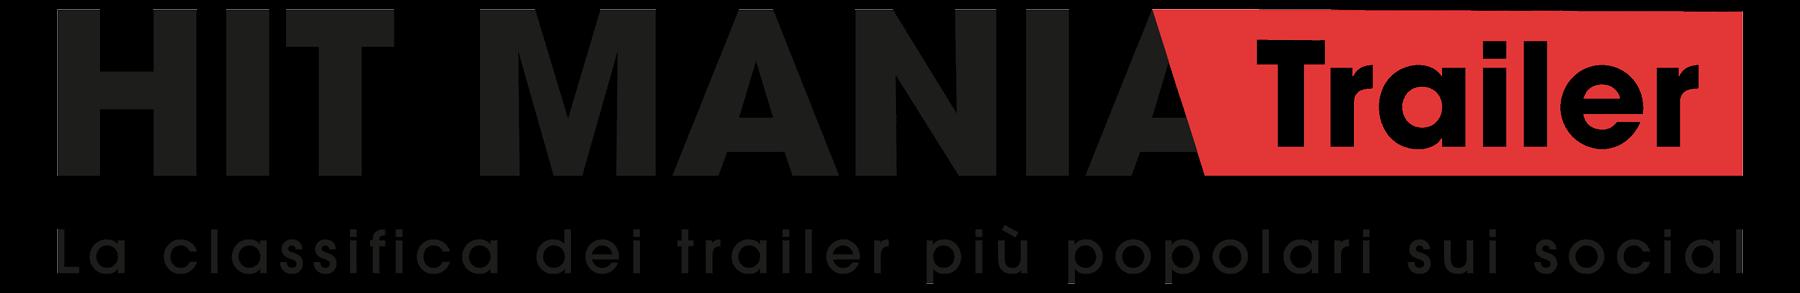 hitmania trailer